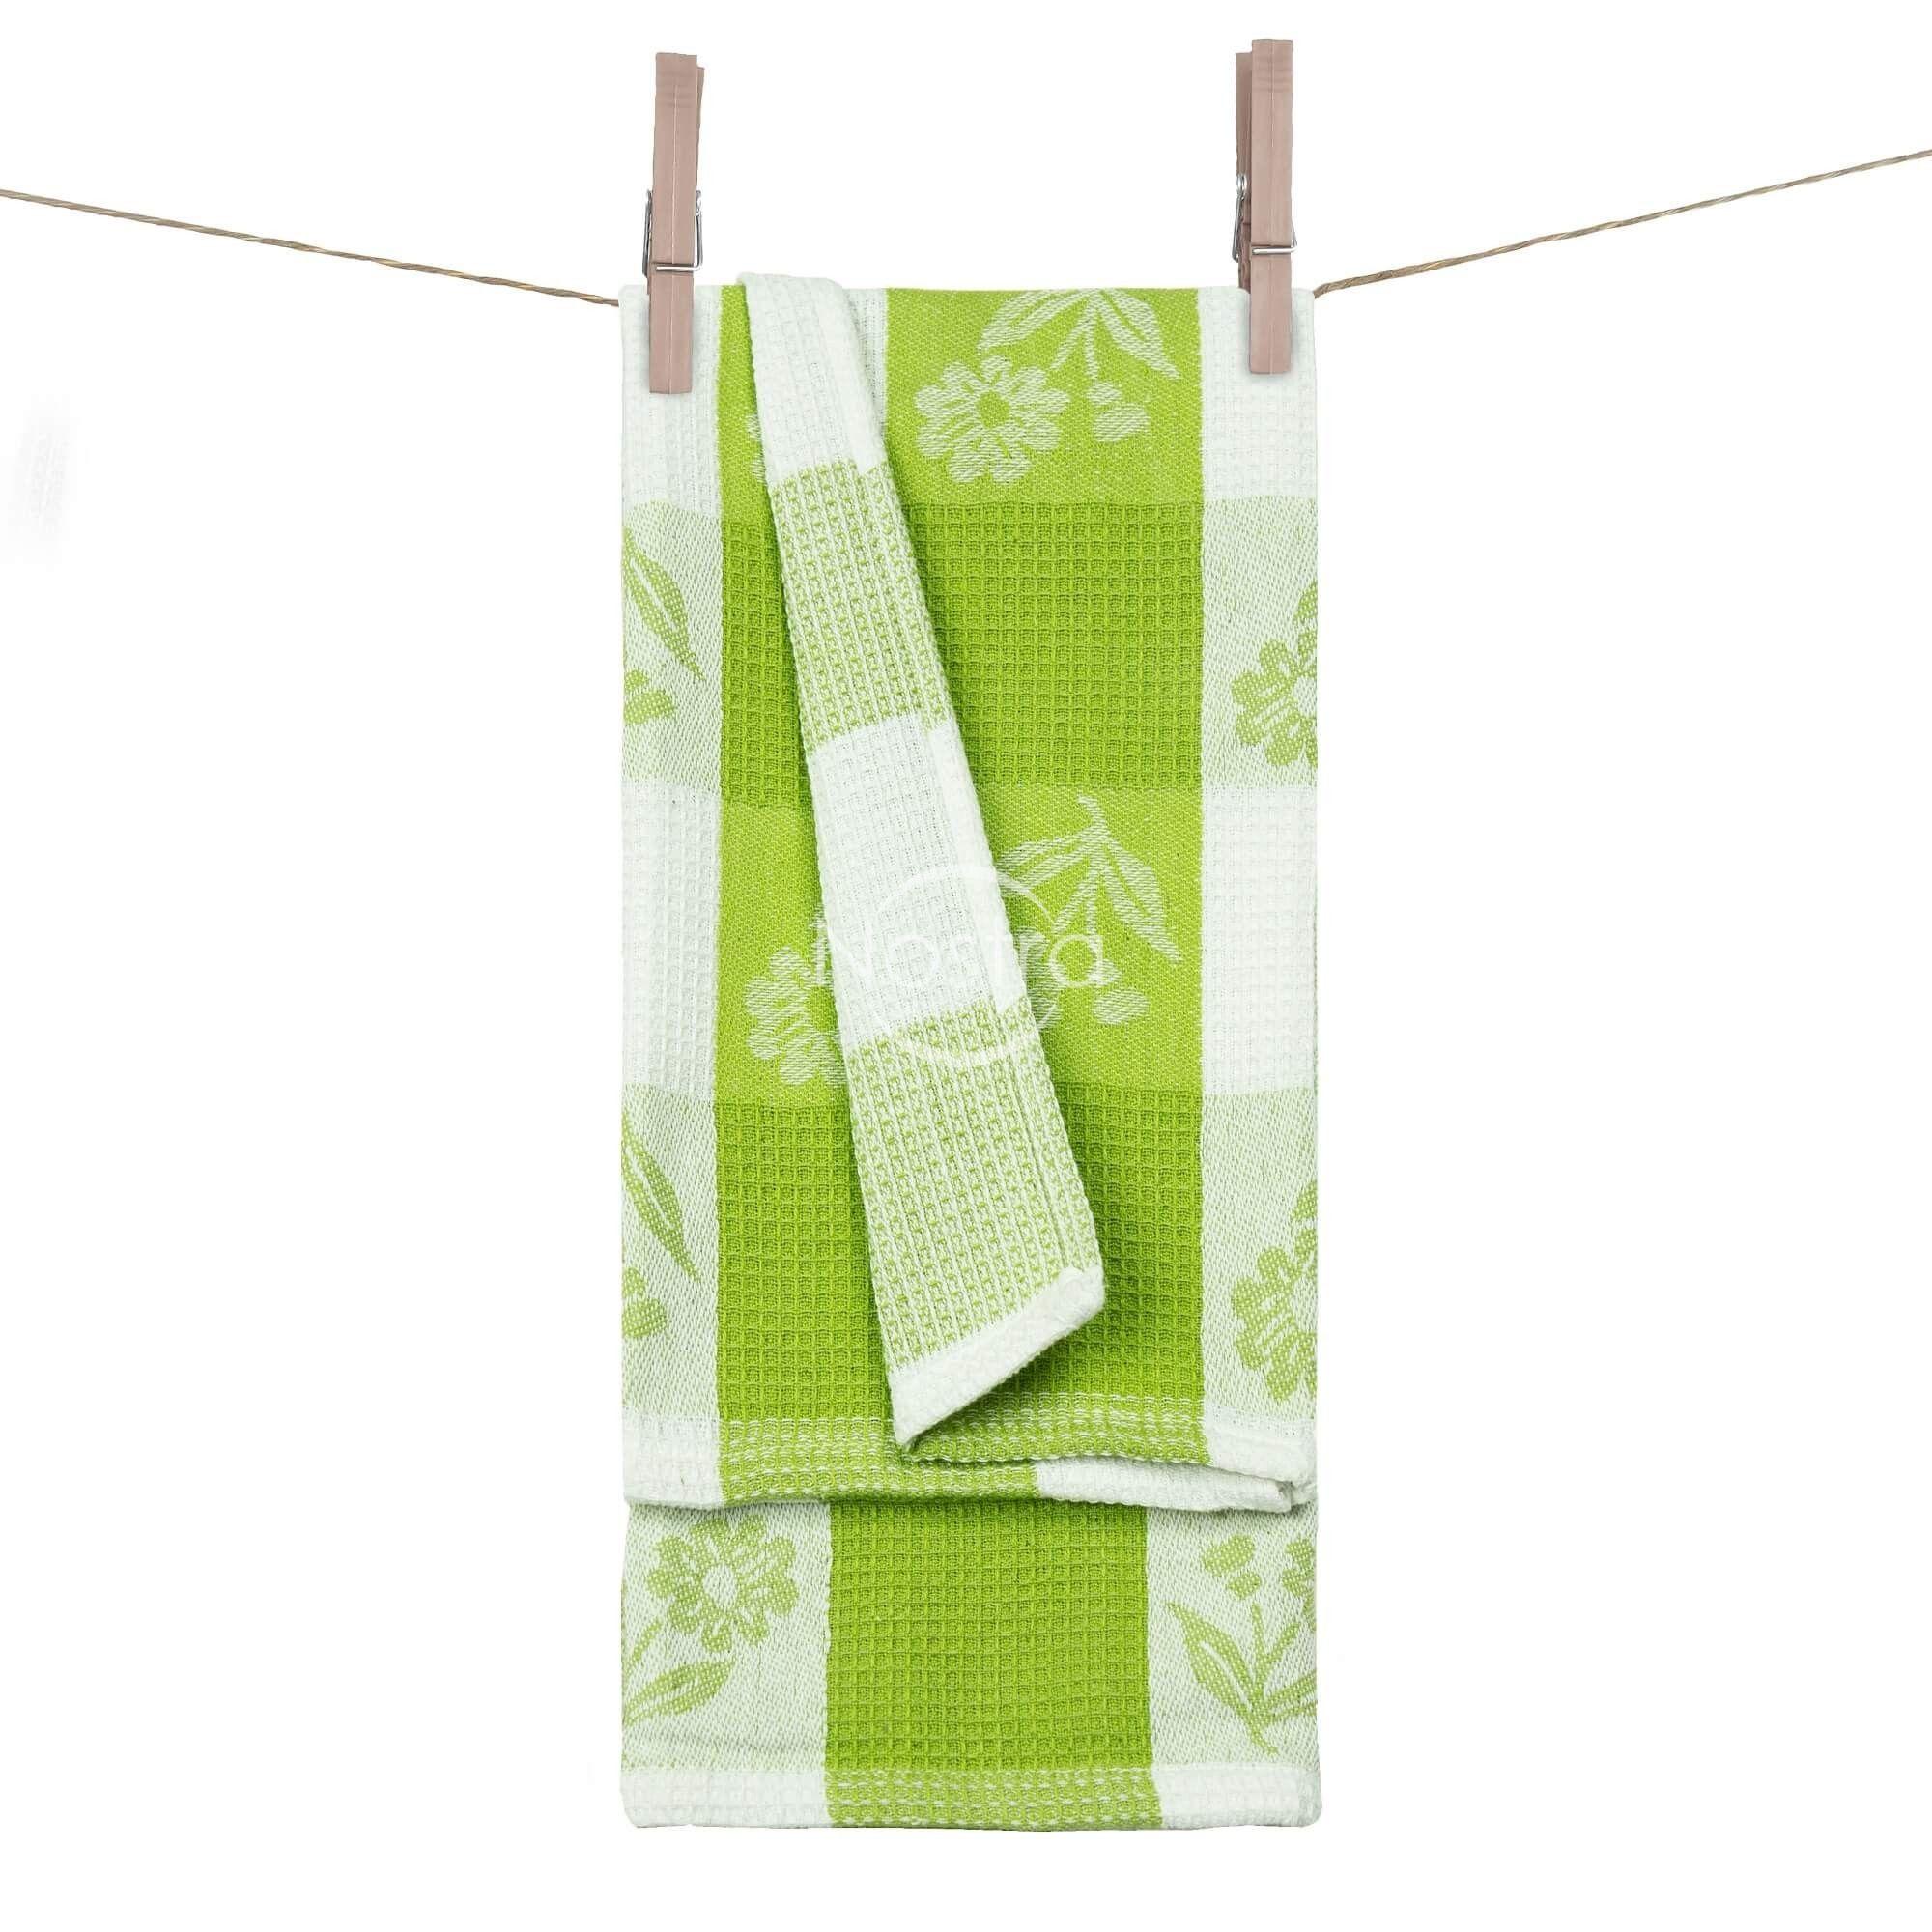 Virtuvinis rankšluostis WAFEL-240 T0102-SPRING GRE 50x70 cm